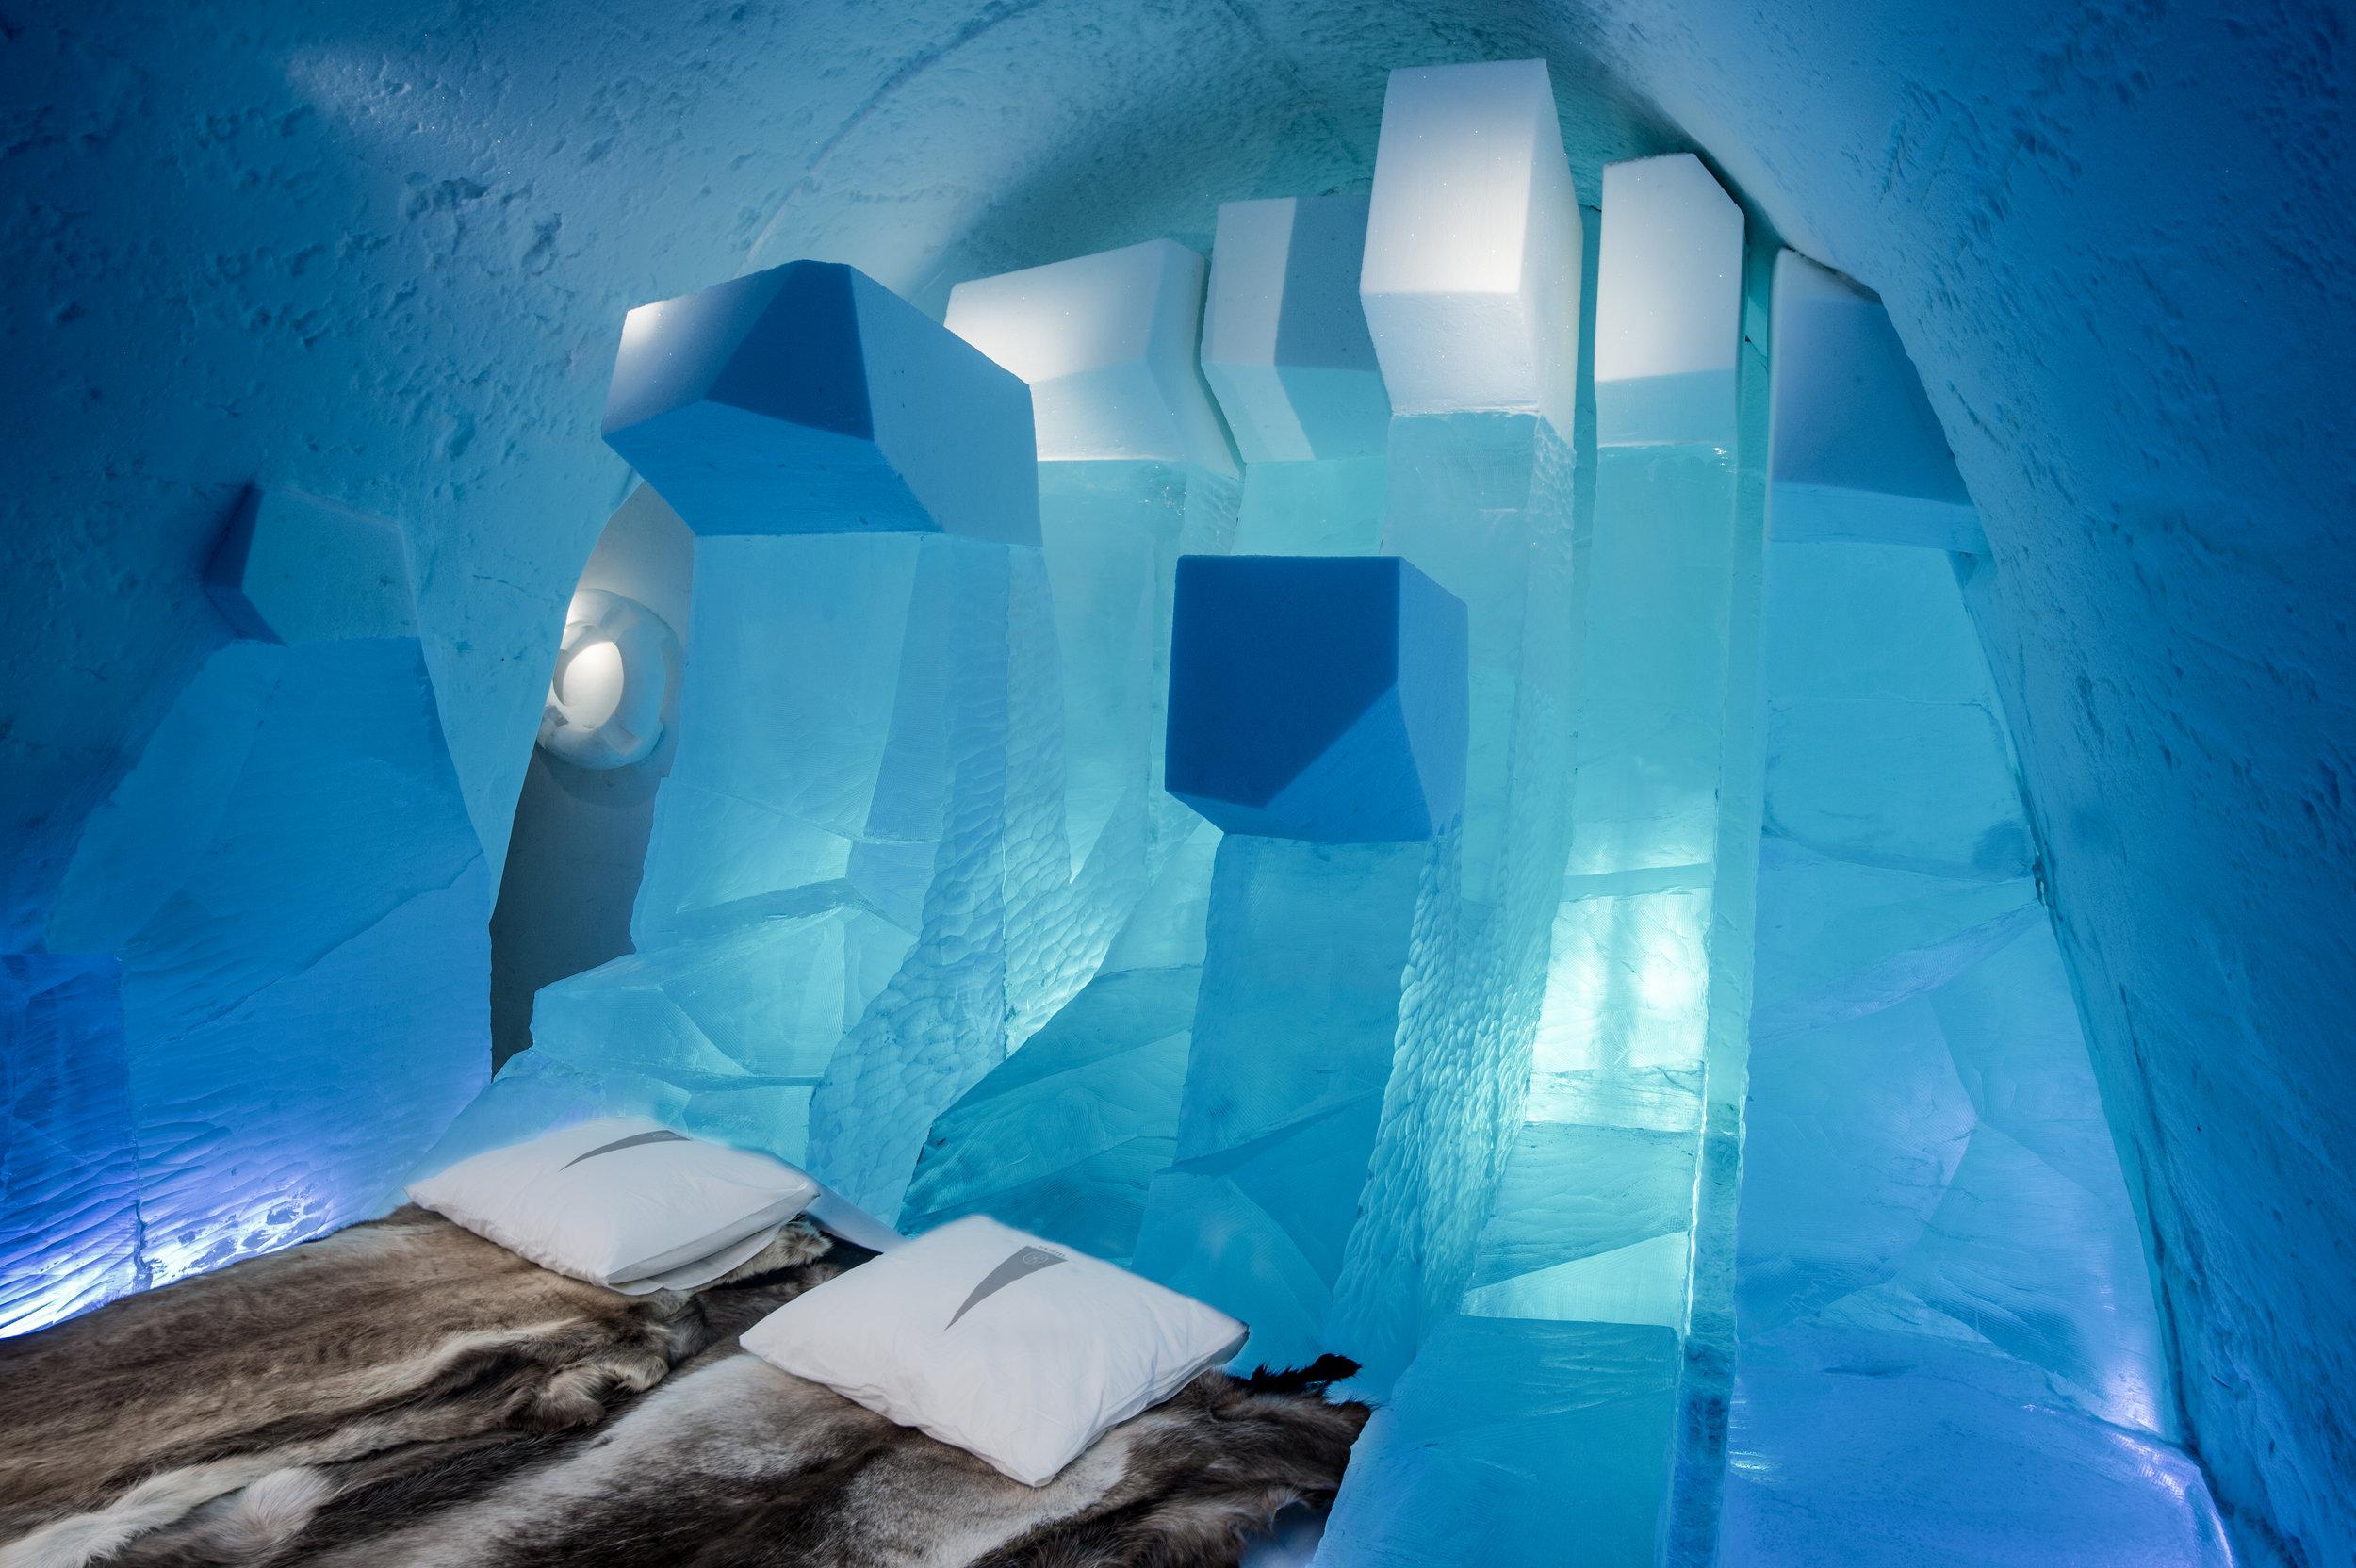 LAPLAND WAVES-Luca Roncoroni-- ICEHOTEL 27 photo by - Asaf Kliger  (2 of 2).jpg